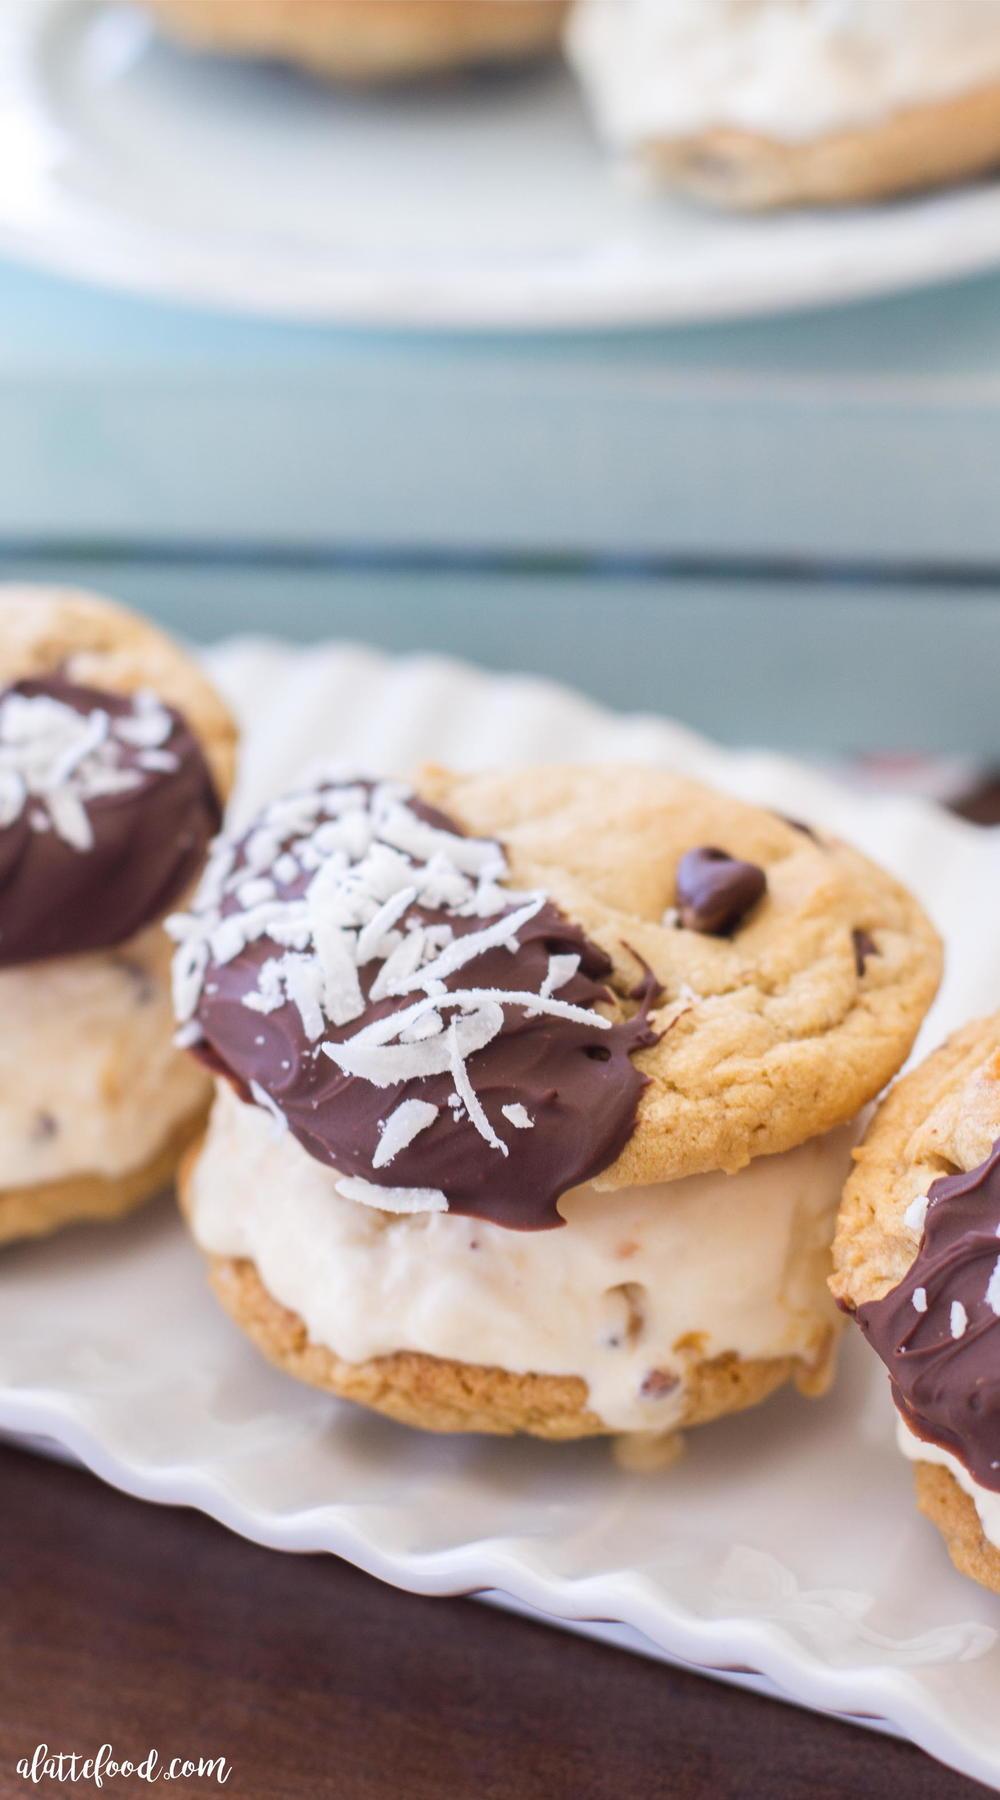 Mocha Coconut Caramel Ice Cream Sandwiches | FaveSouthernRecipes.com